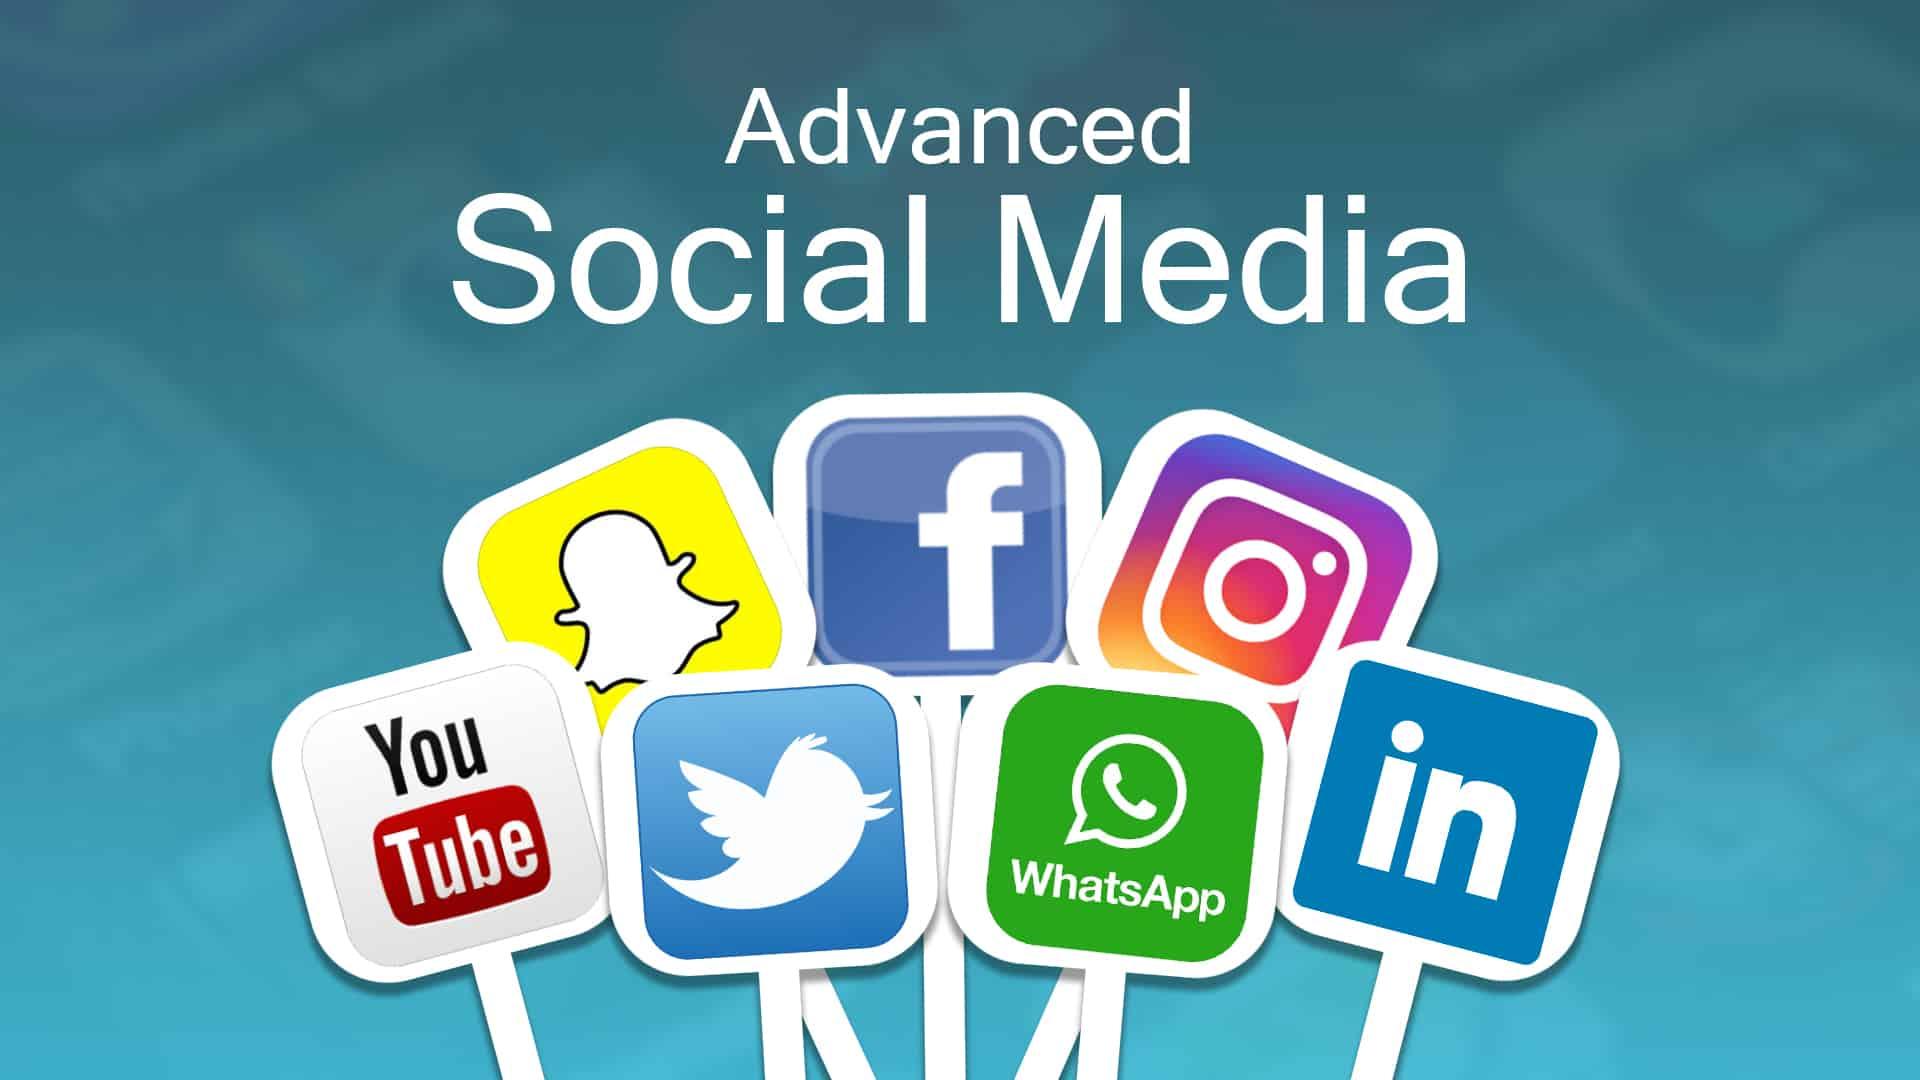 Advanced social media